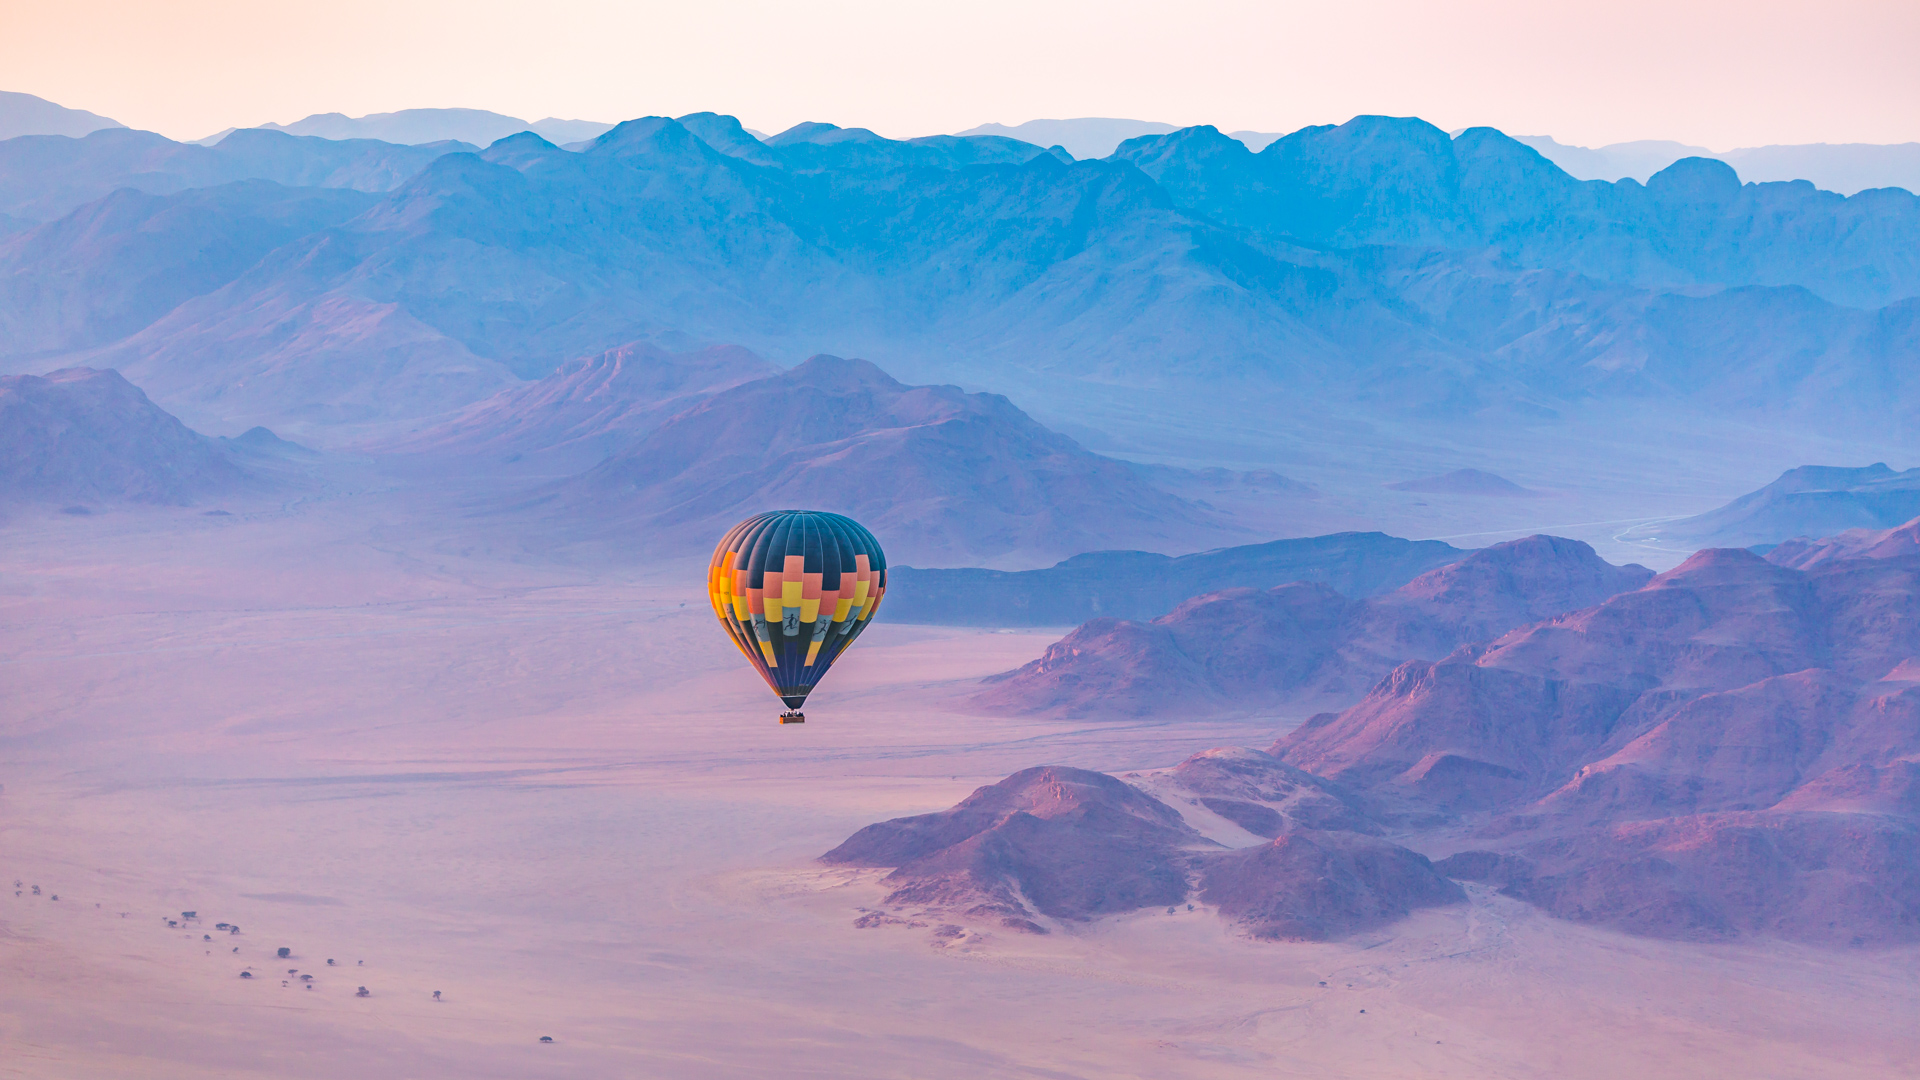 Balon nad pustynią Namib